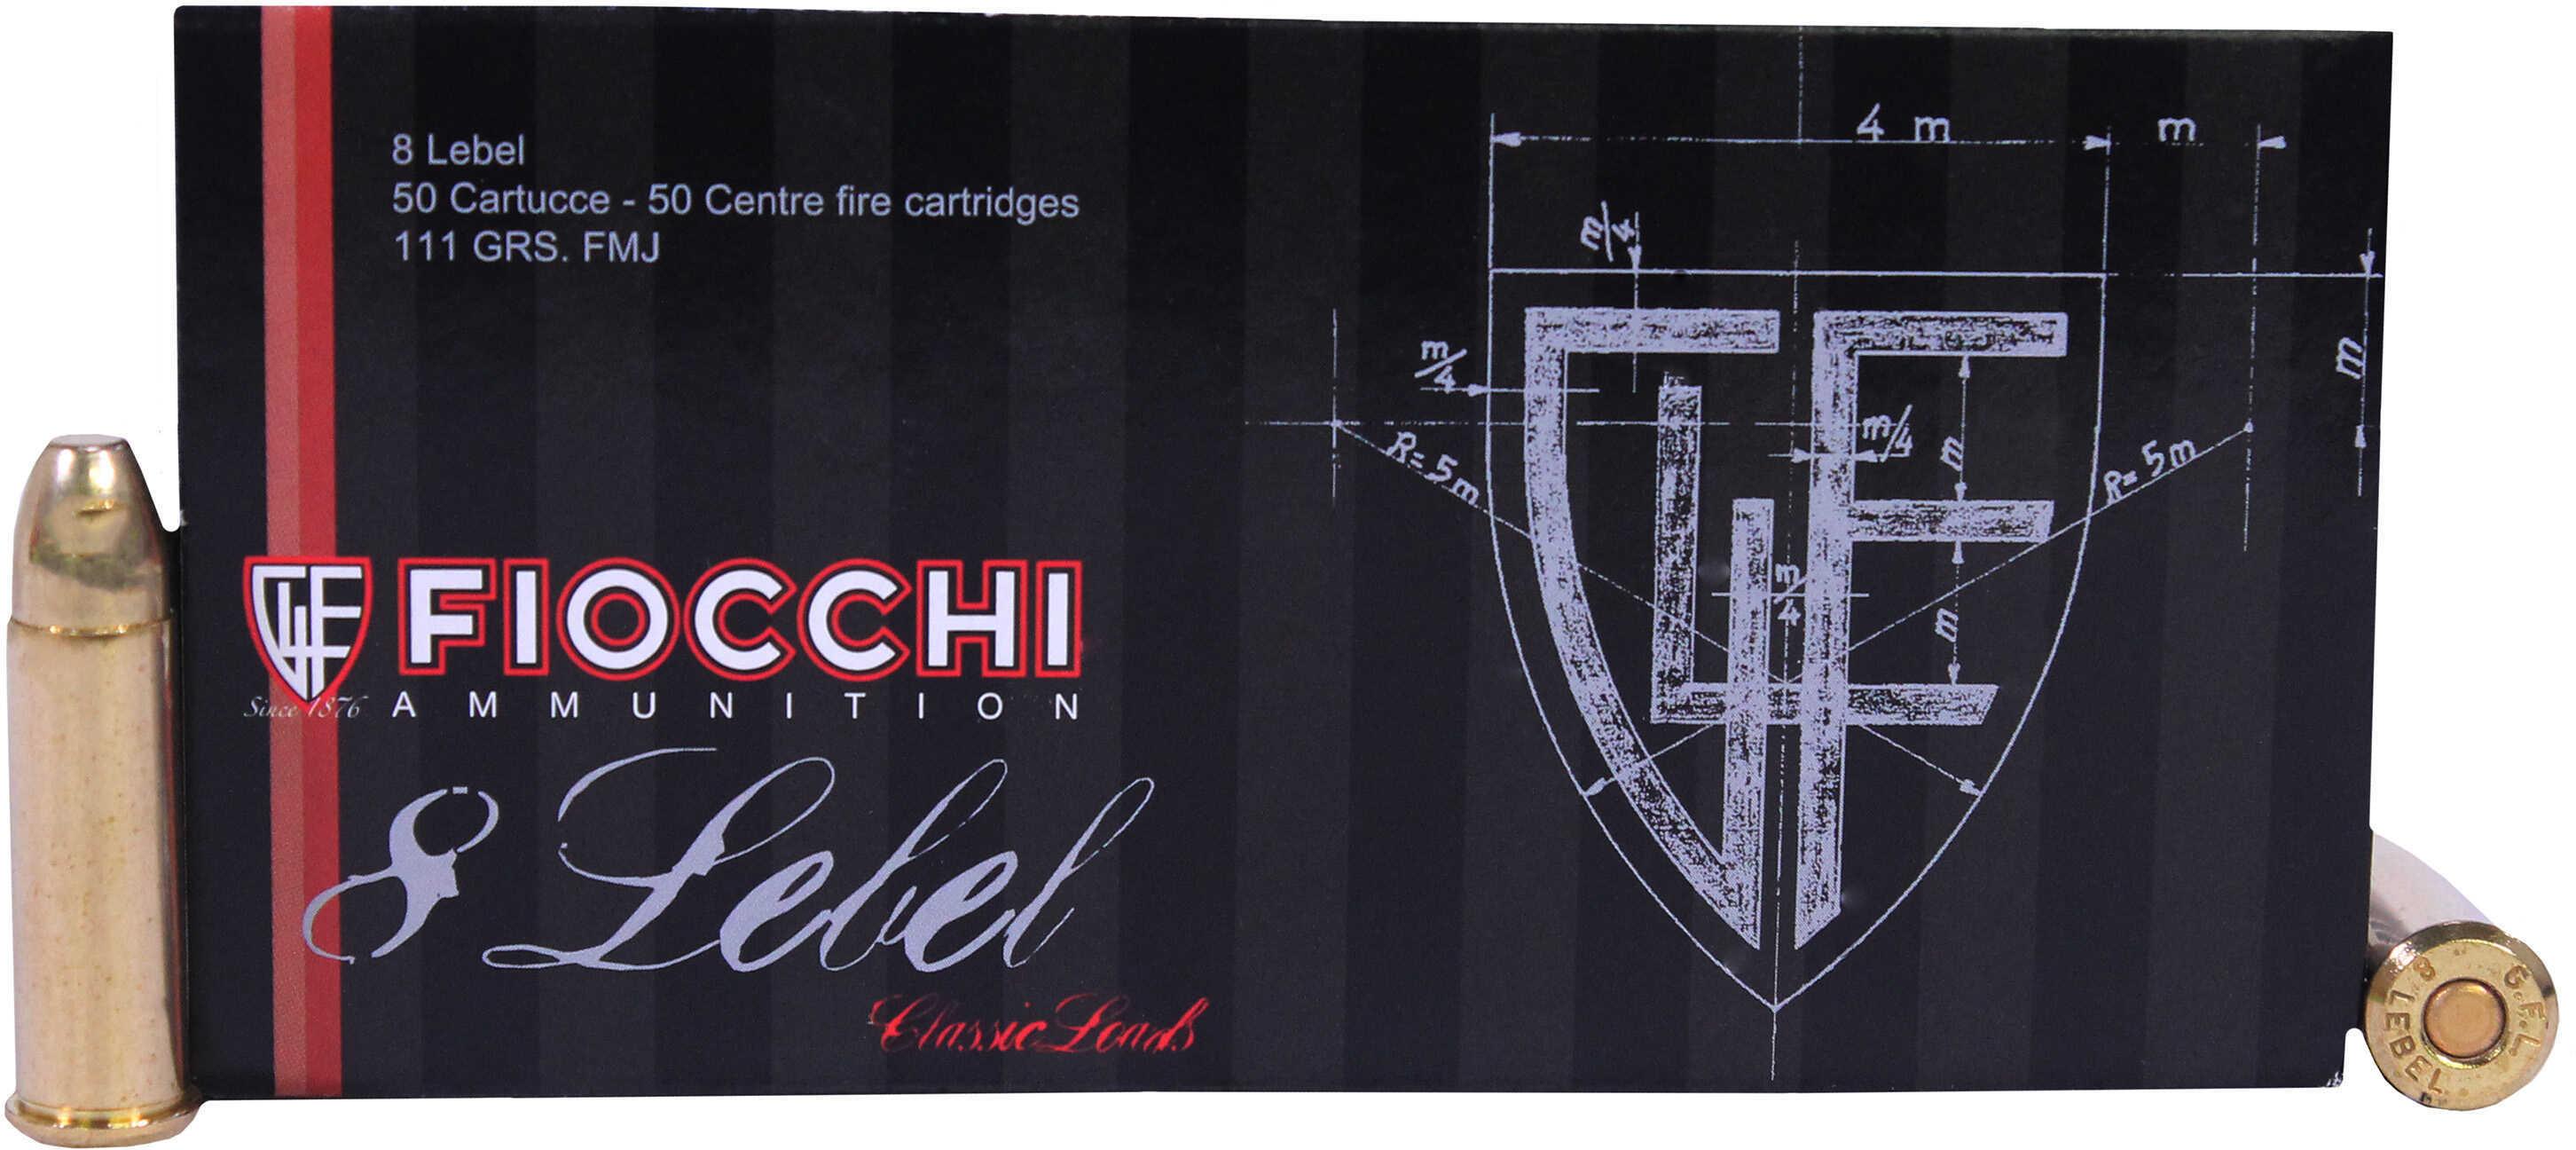 Fiocchi 8mm Lebel 111 Grain Full Metal Jacket Ammunition, 50 Rounds Per Box Md: 8L